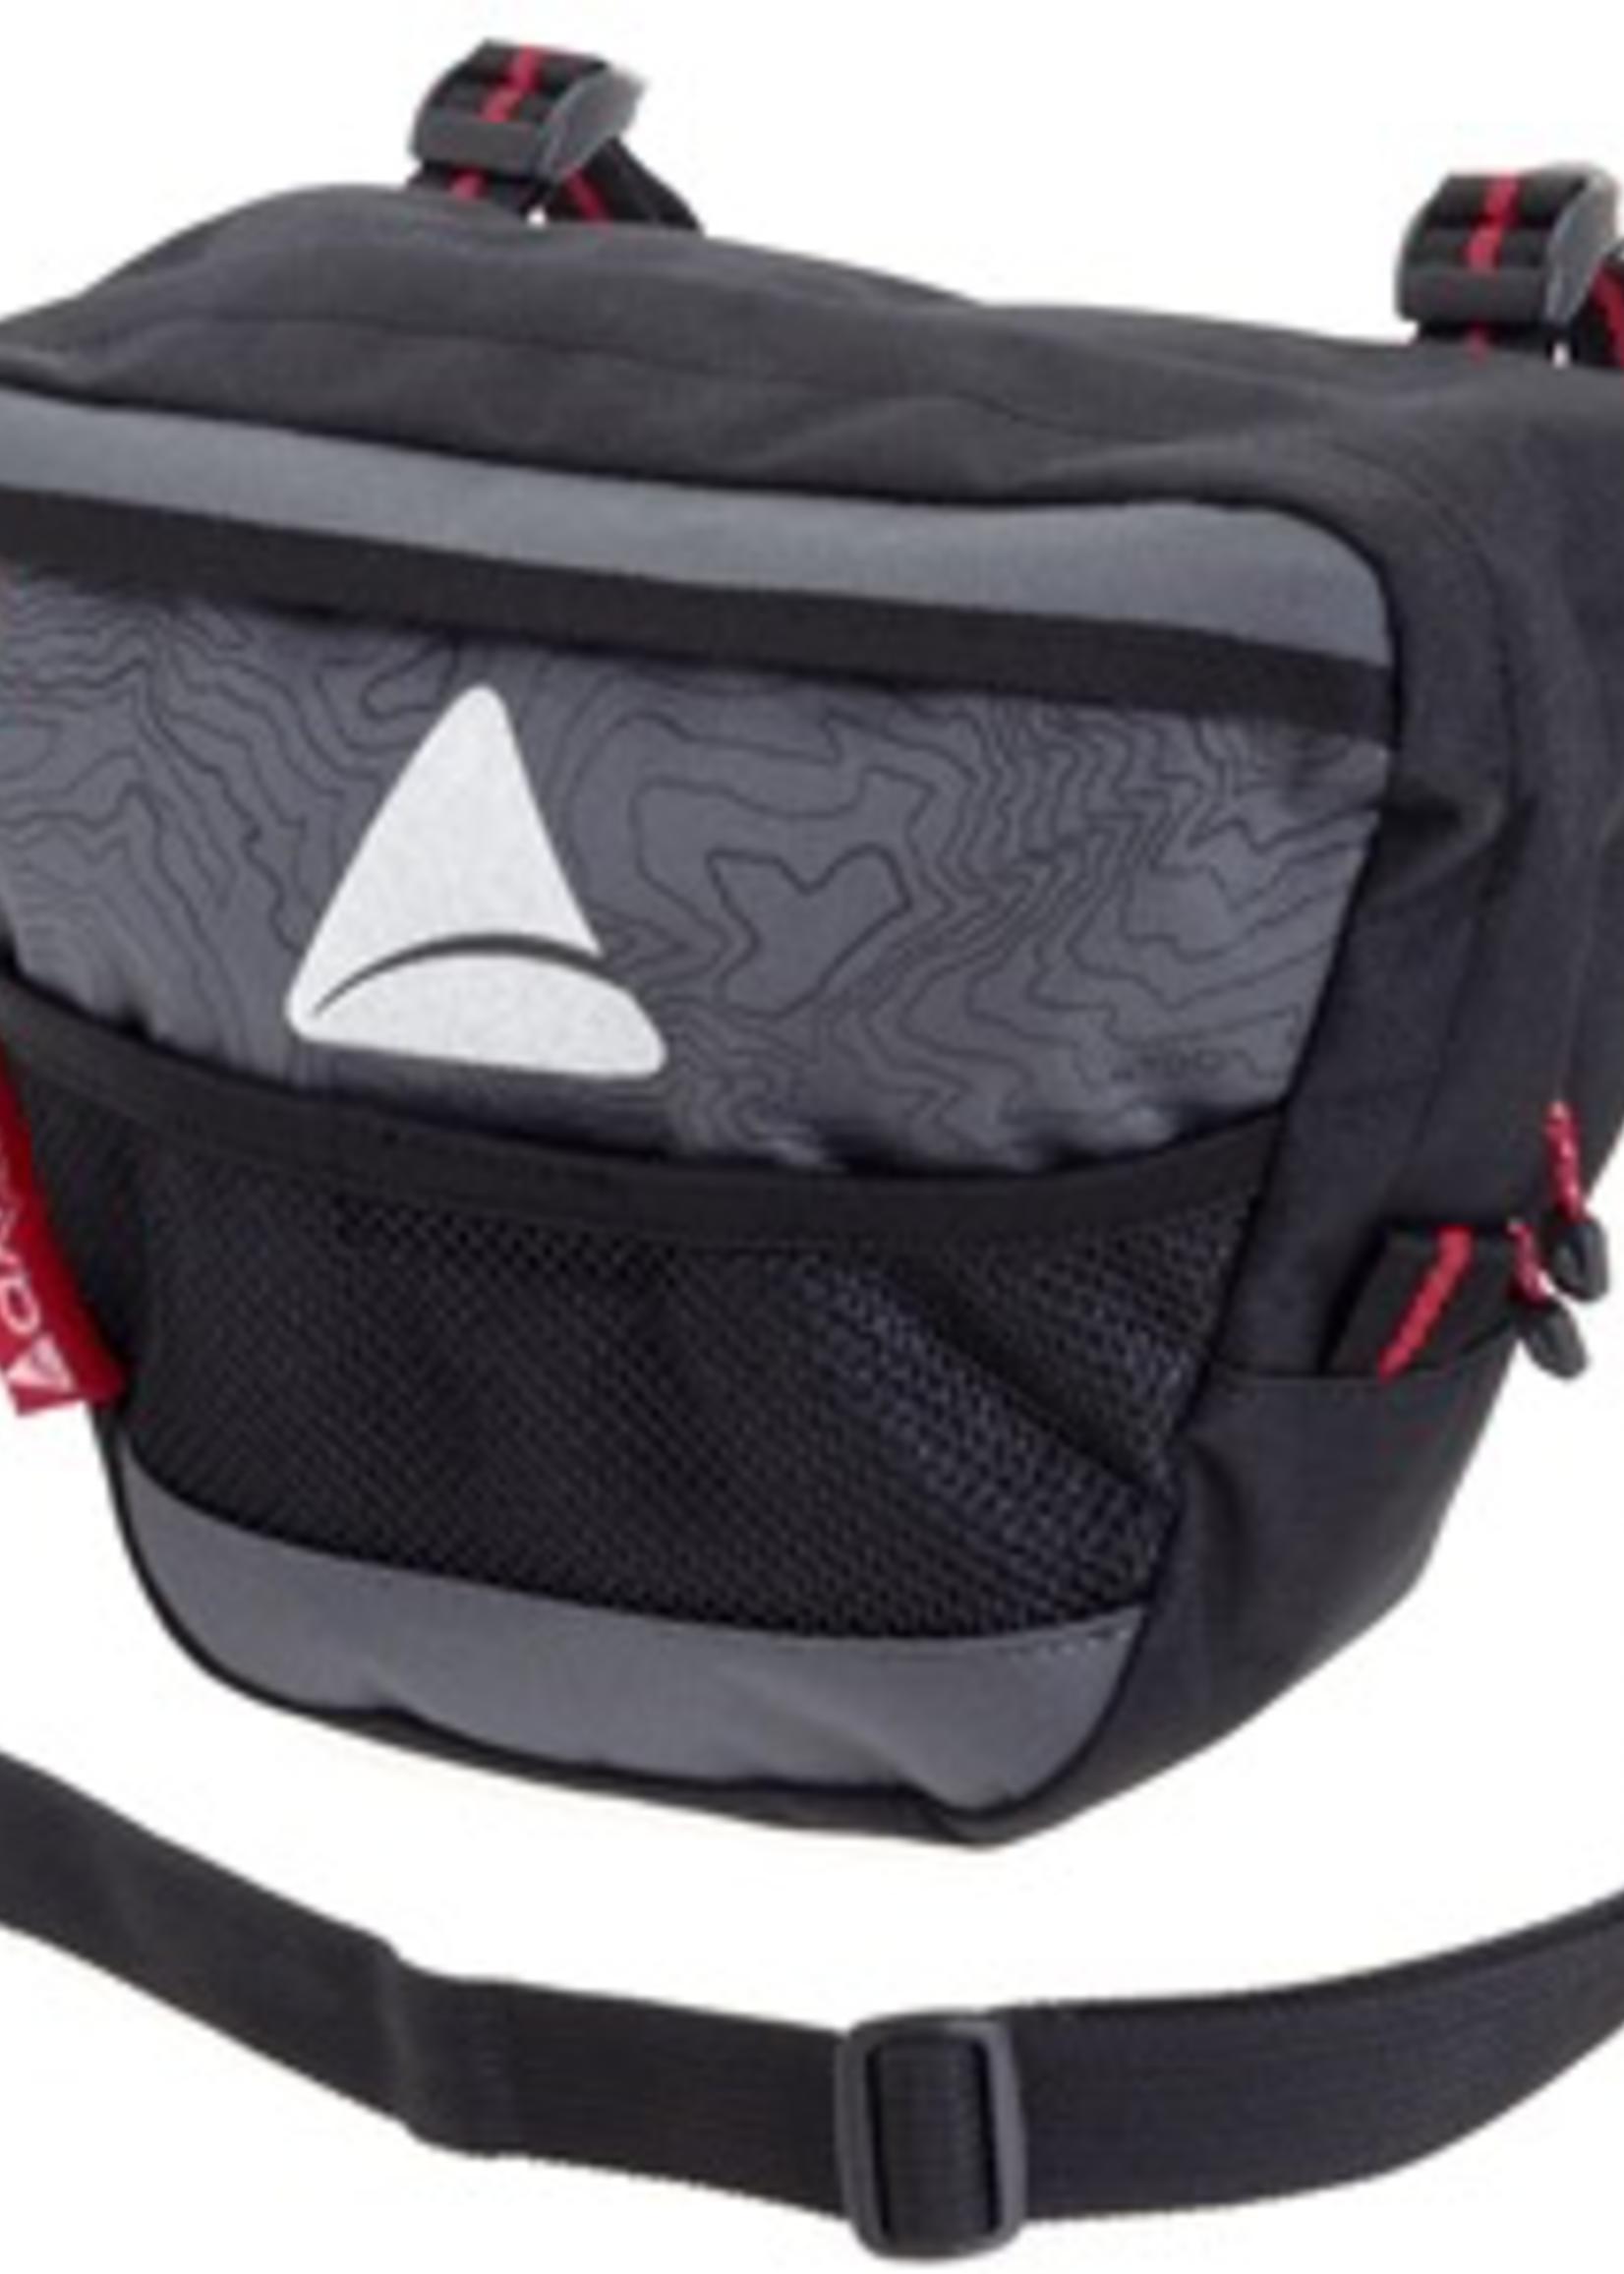 AXIOM SEYMOUR P4 HANDLE BAR BAG